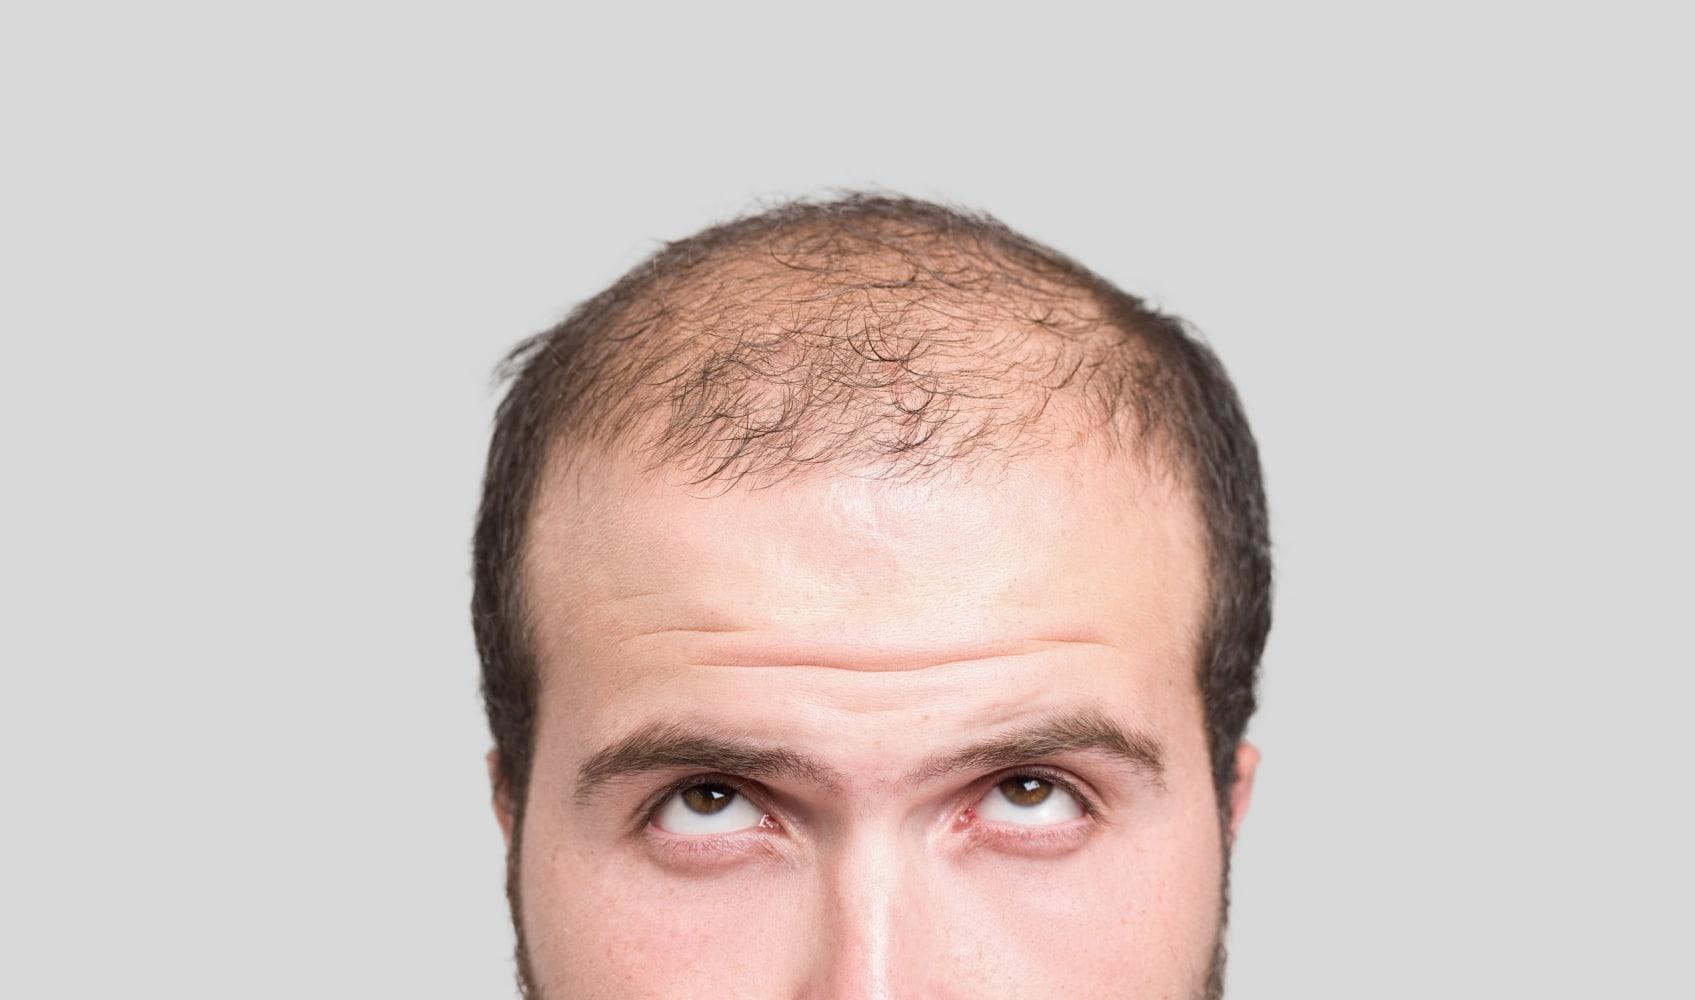 Pleasant Hair Loss Drug Propecia Carries Risk Of Losing Something Else Hairstyles For Men Maxibearus